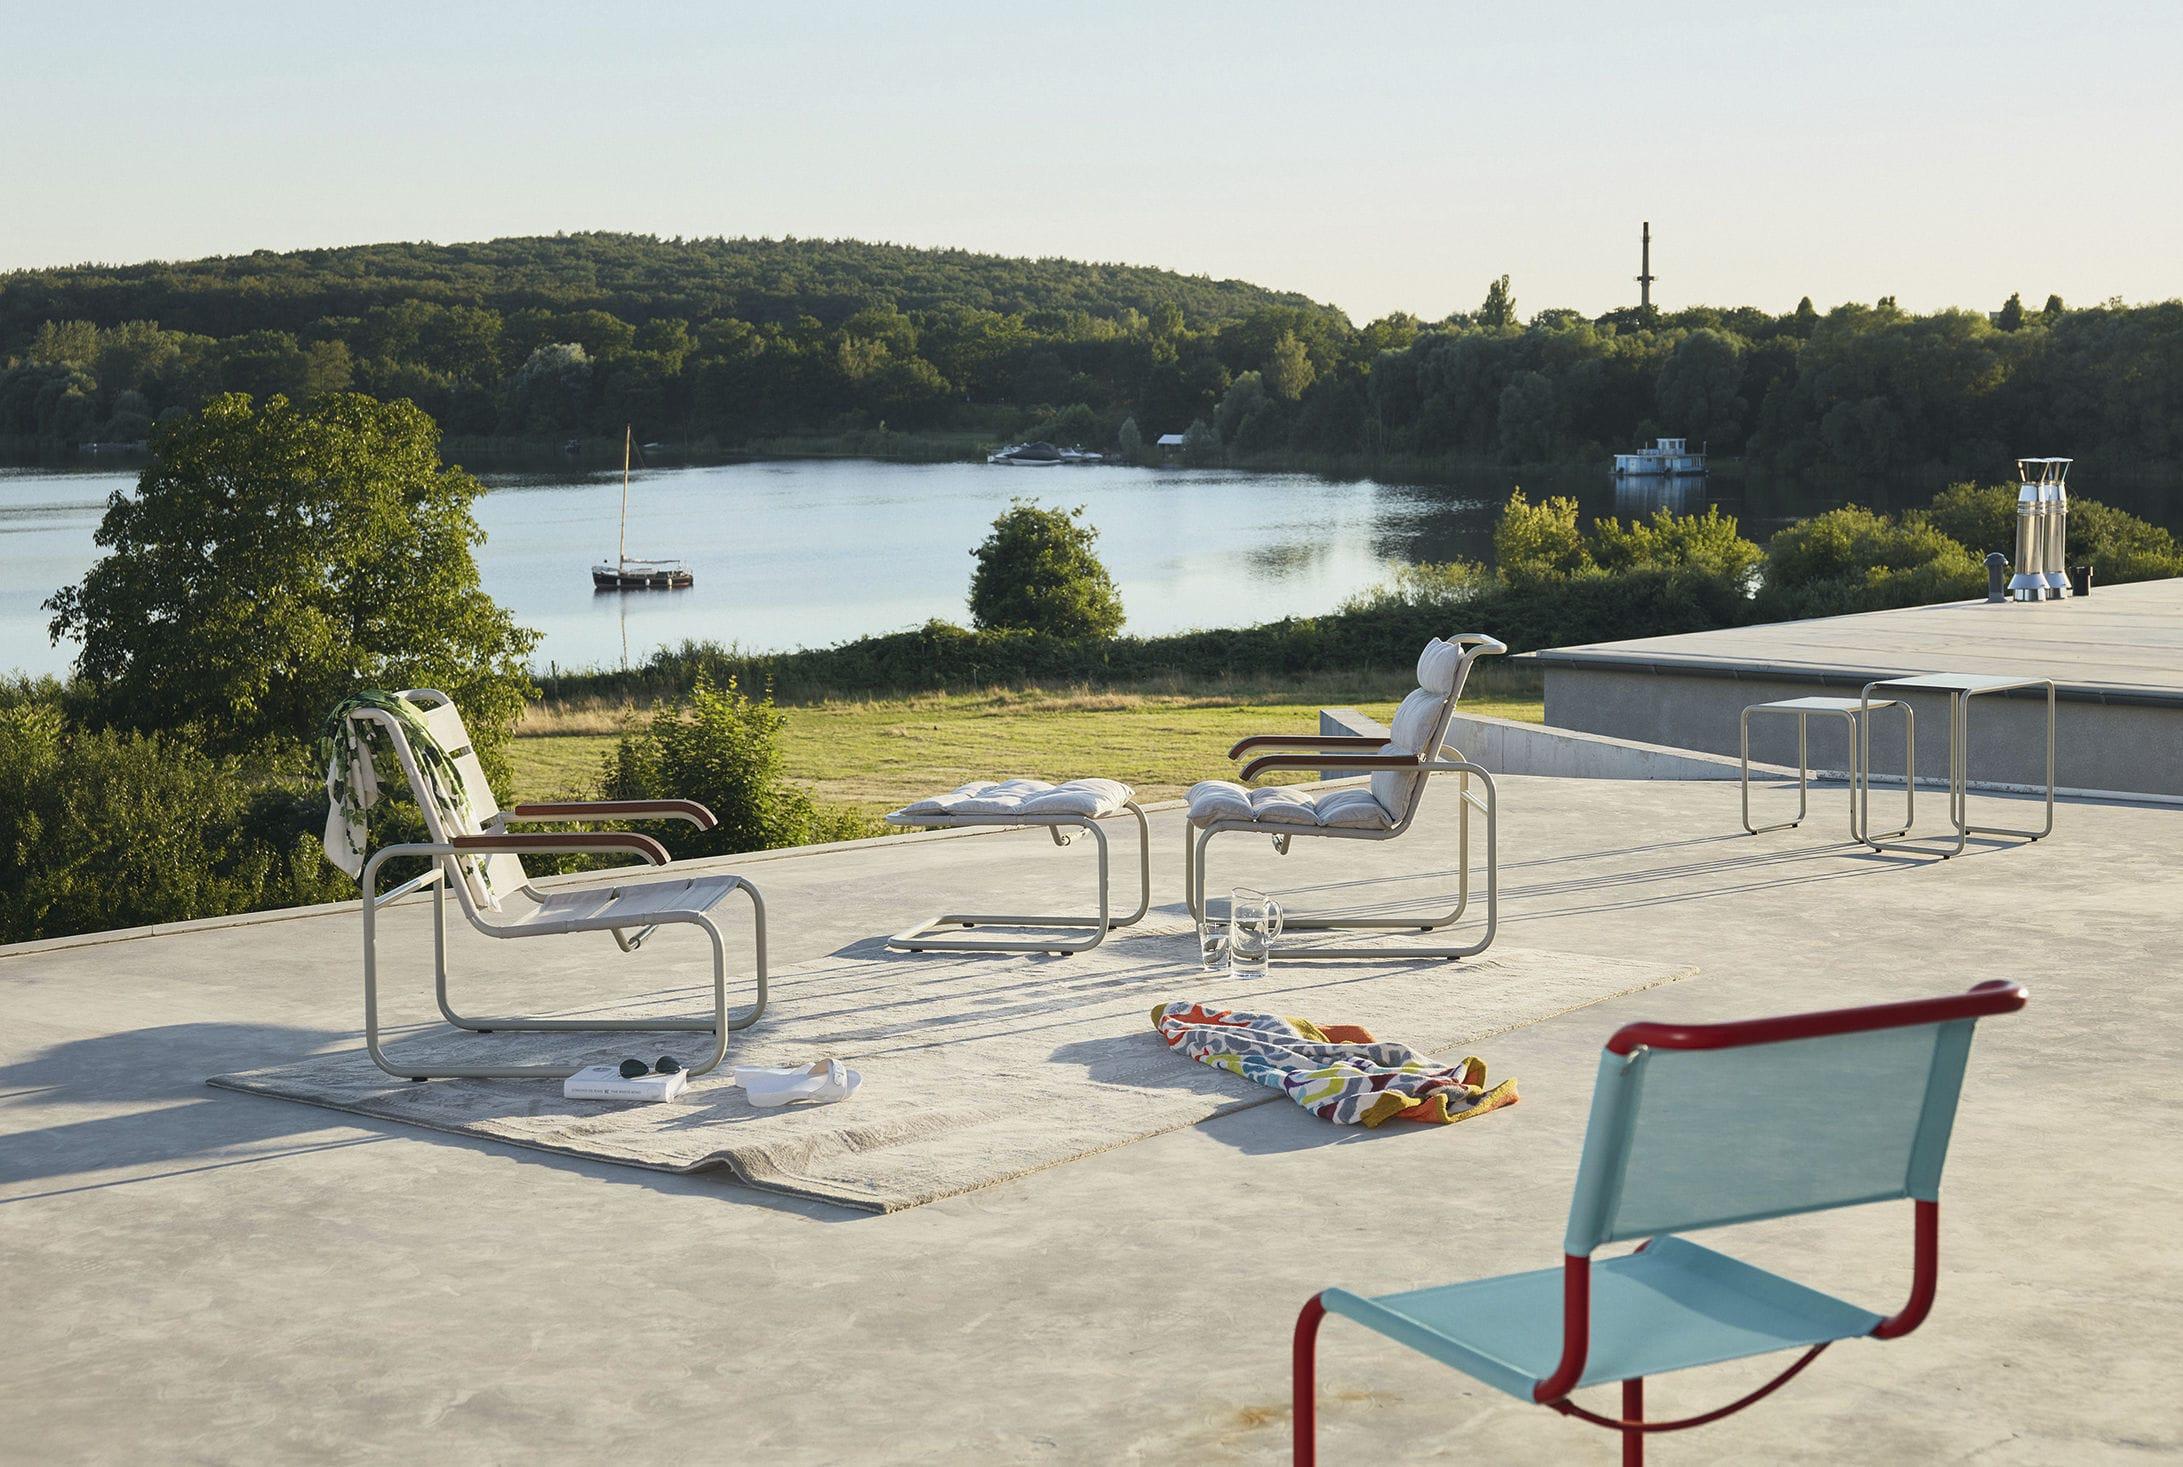 Sill N De Dise O Bauhaus De Madera De Cuero De Acero S 35  # Muebles Bauhaus Caracteristicas